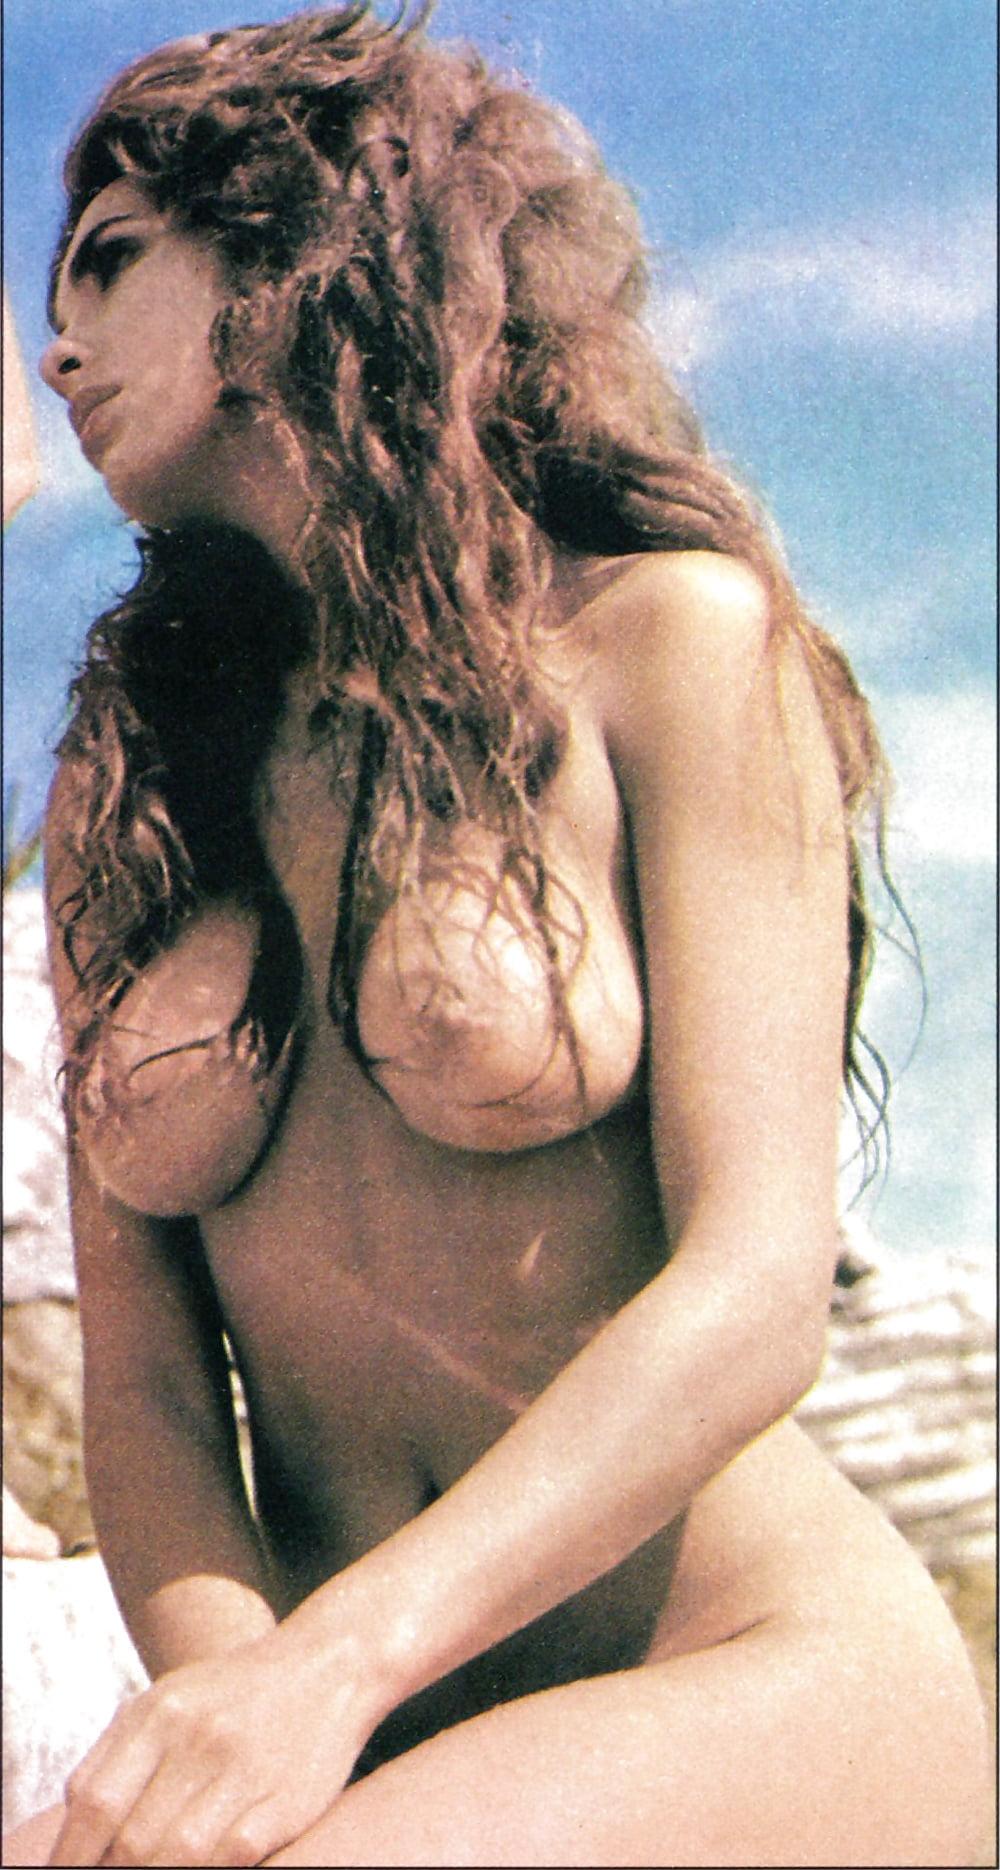 Nadia cassini porno See And Save As Nadia Cassini Porn Pict 4crot Com